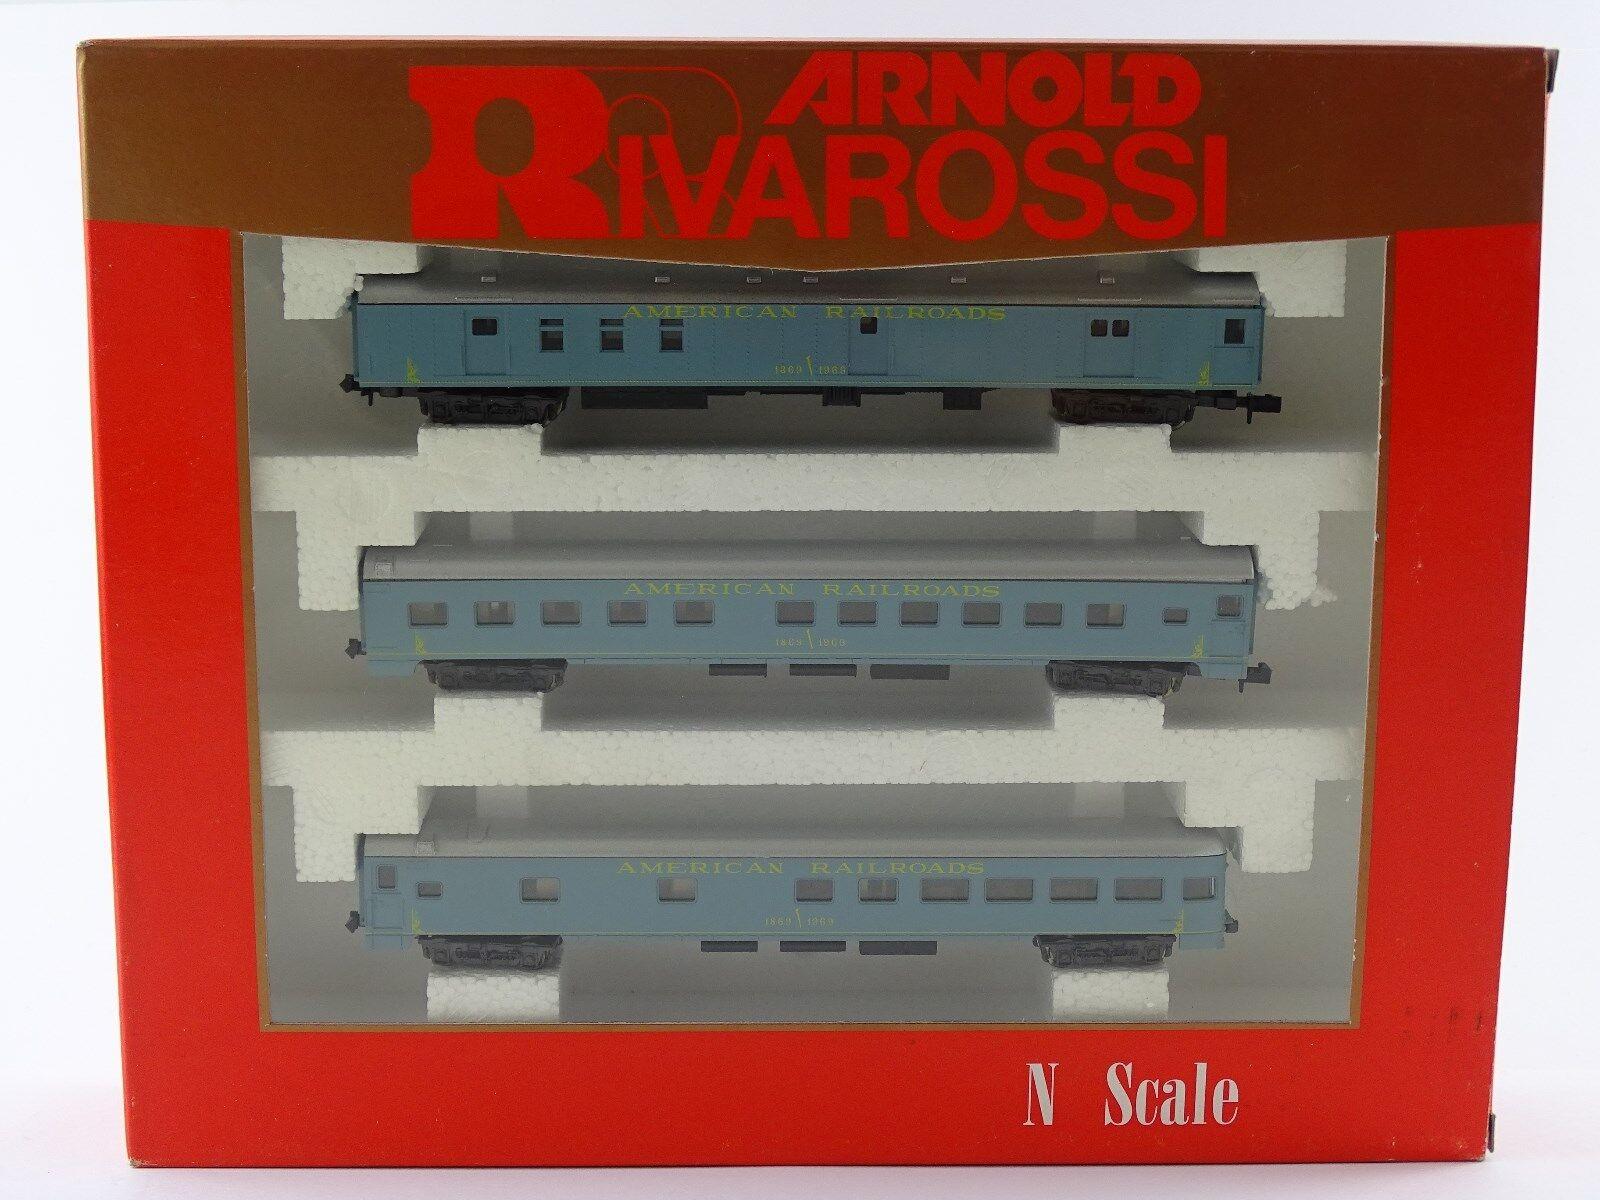 Rivarossi Arnold 0581 a los turismos set American Railroads n nuevo embalaje original Rare